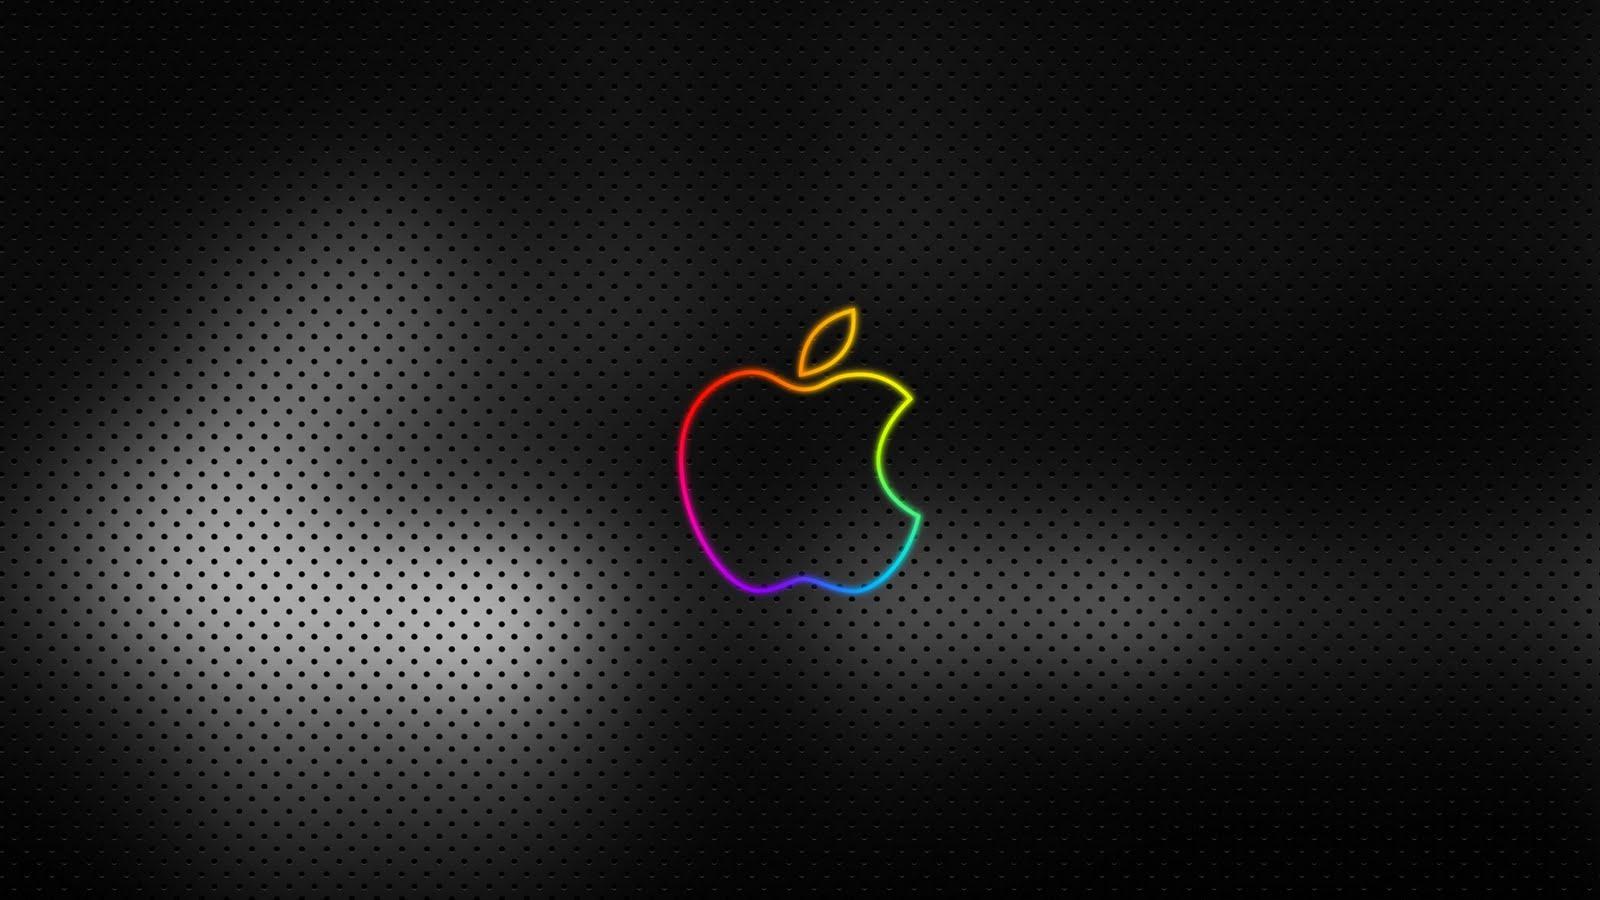 http://3.bp.blogspot.com/_64QM8mYklnU/TJcjxFXVqaI/AAAAAAAAAE4/SNNo7lxaTfY/s1600/apple-retro-1920-1080-4206.jpg